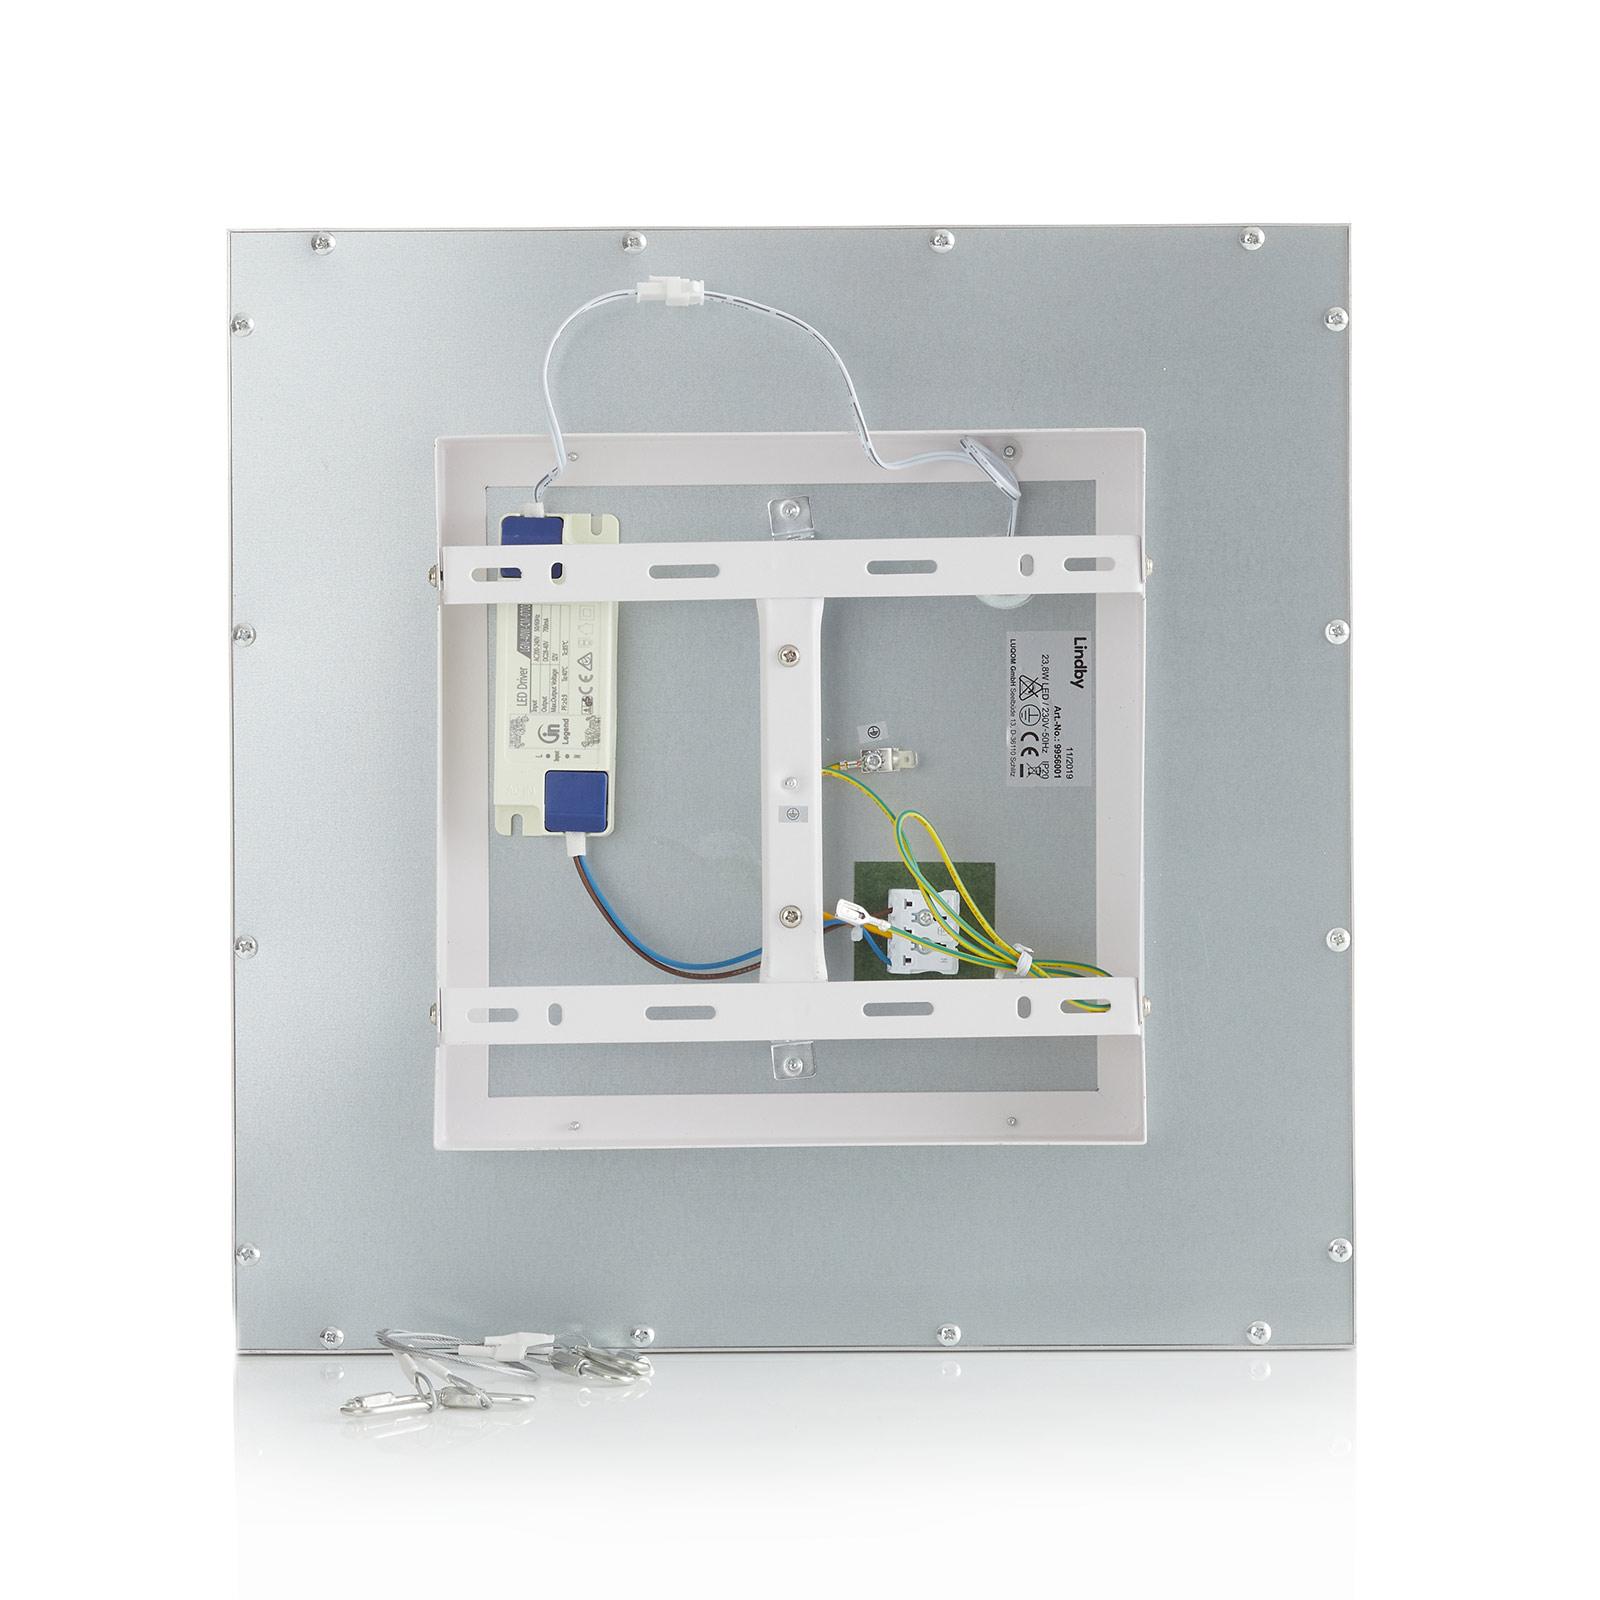 Lindby Livel LED panel, 4 000 K, 40 x 40 cm | Lamp24.se